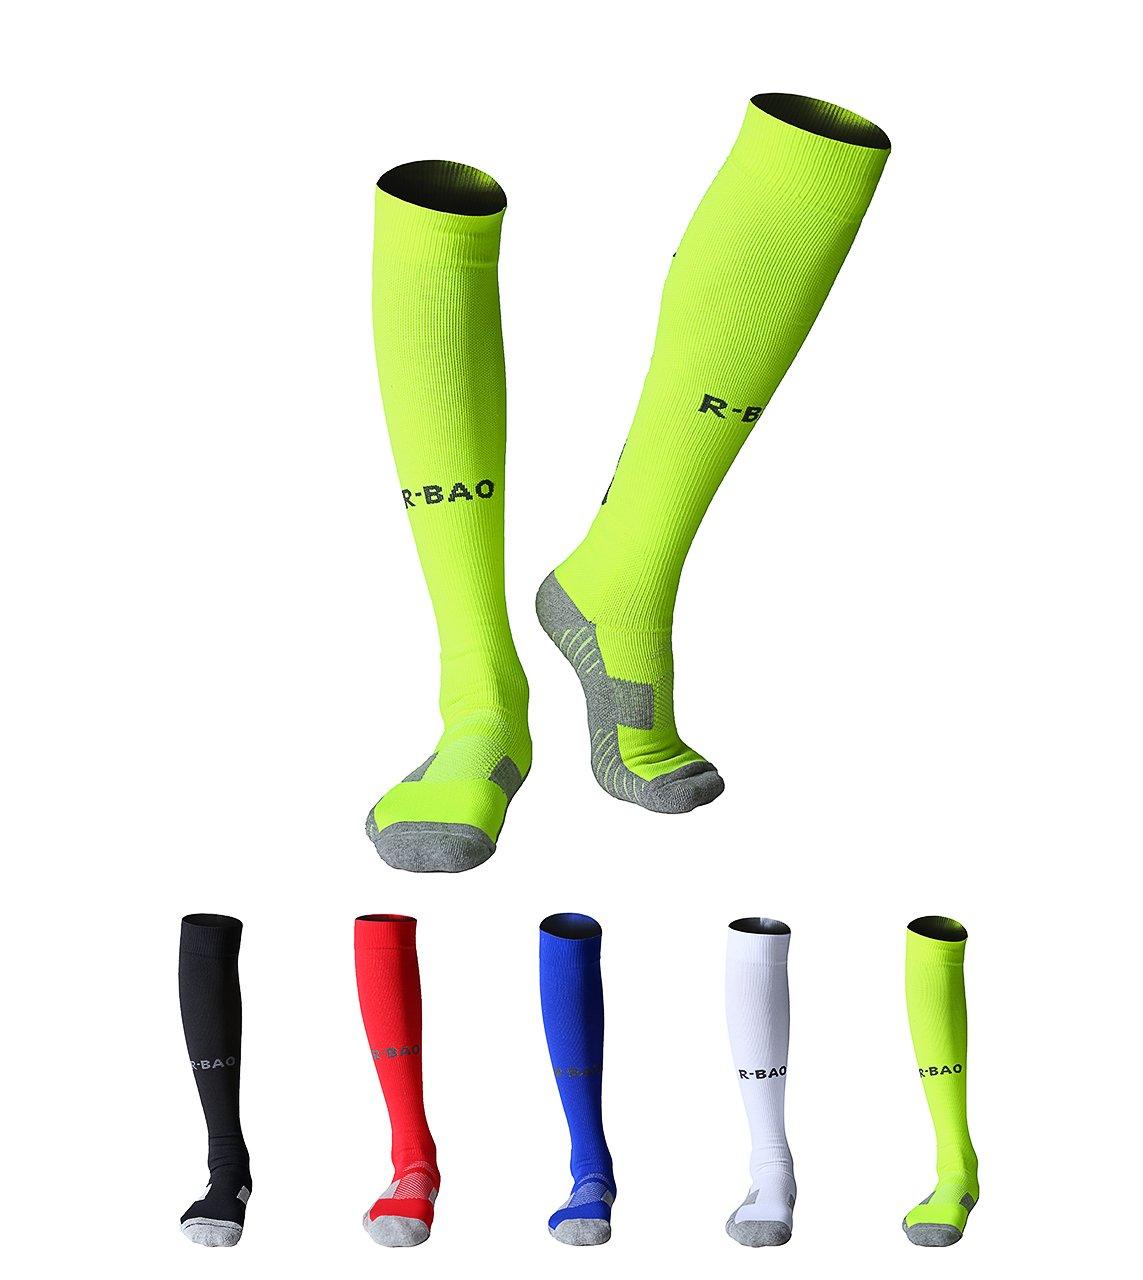 Maibuメンズ2ペアアスレチックソックスソフトコットンクッション圧縮FootballバスケットボールRunning Exerciseソックス B01MDIX4KV Green 2 pairs Green 2 pairs